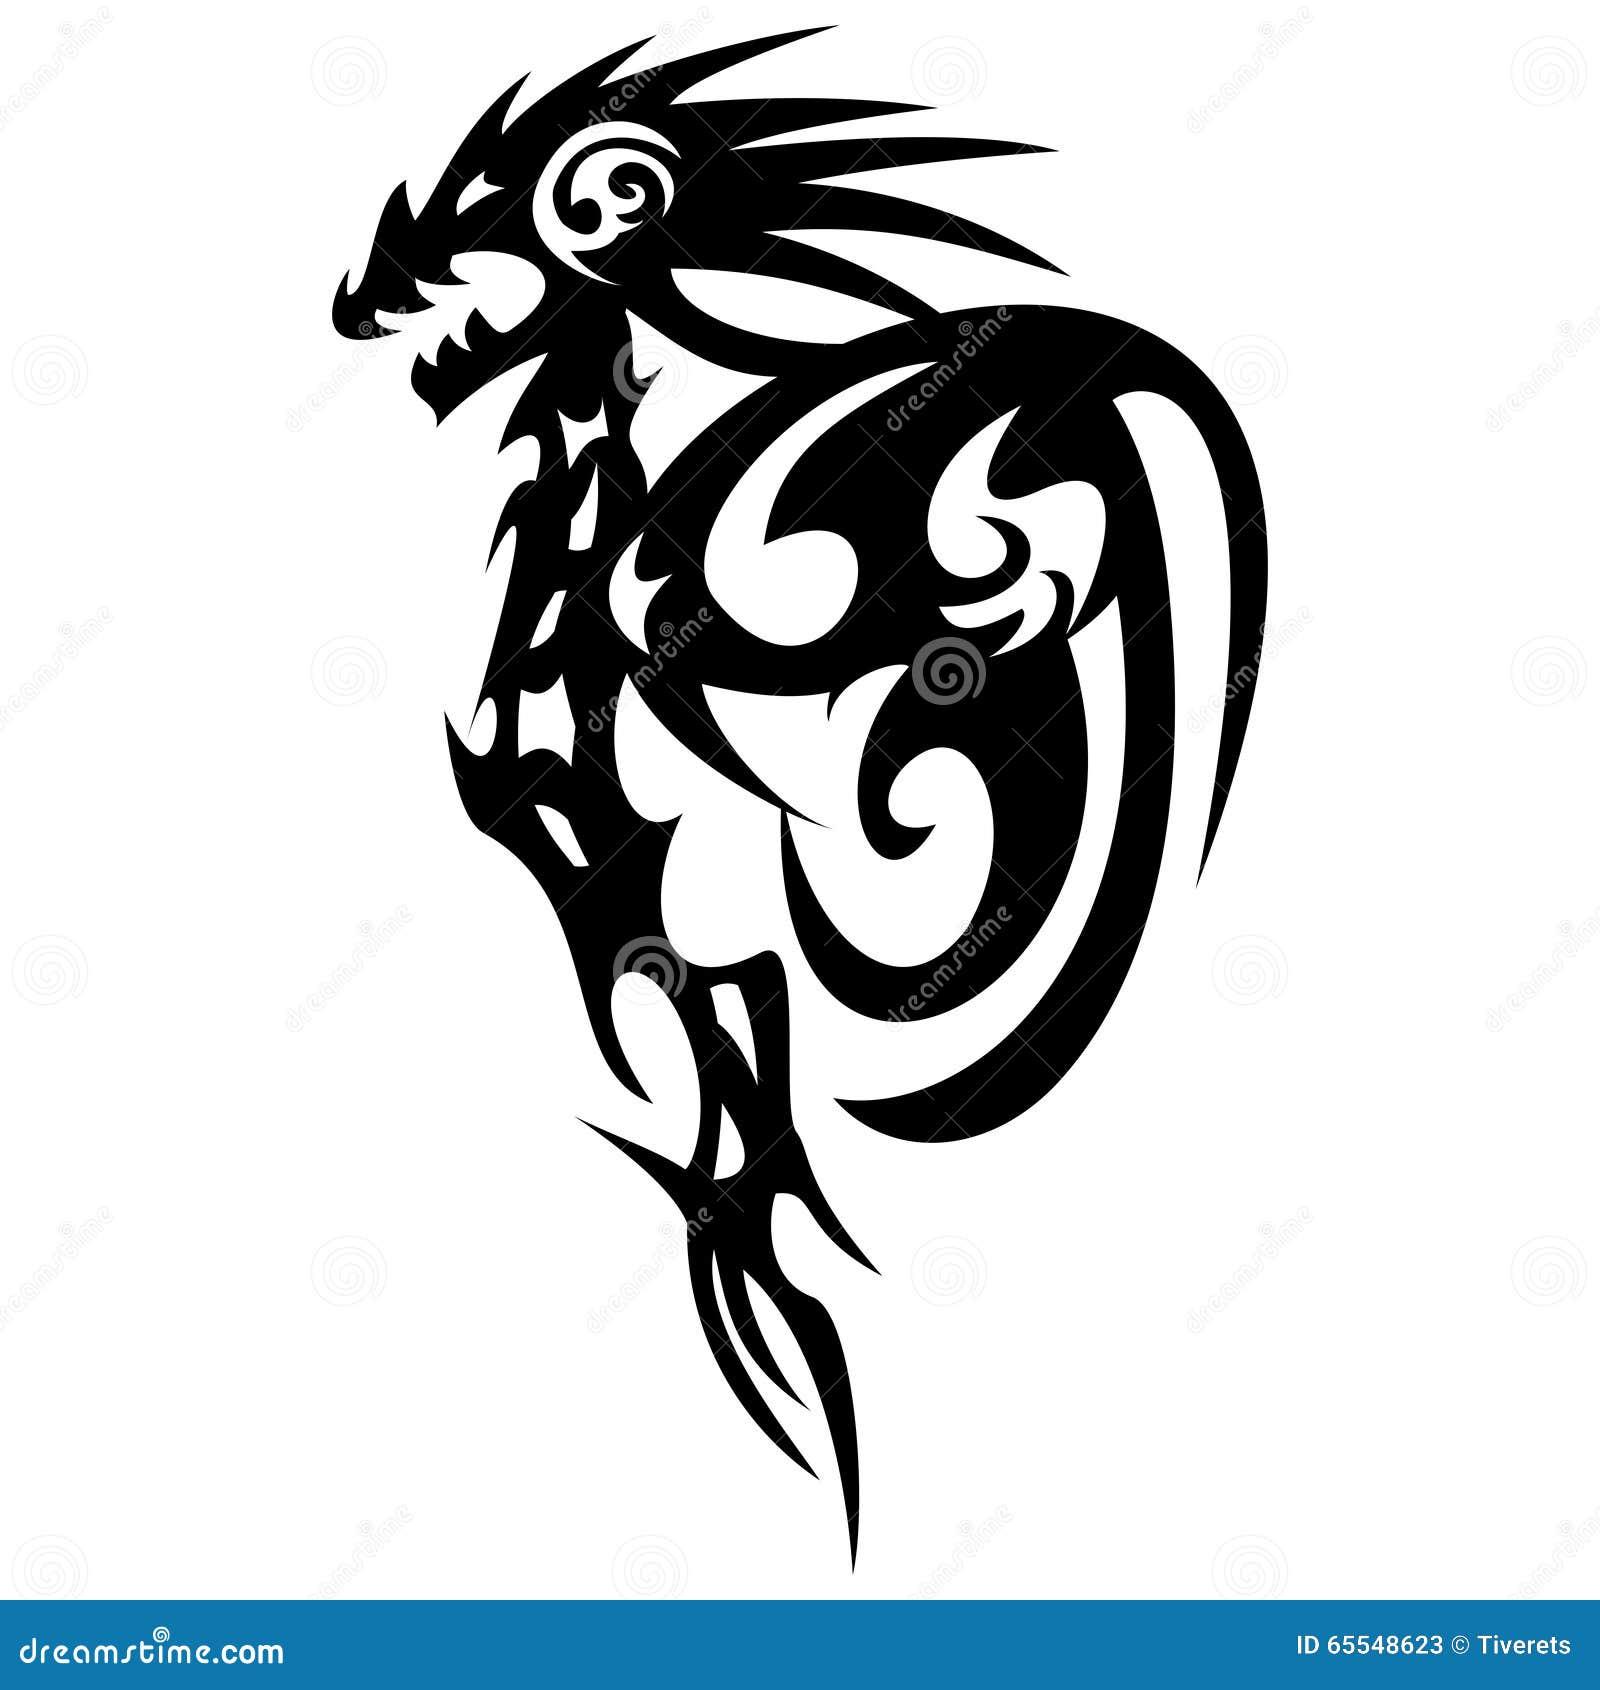 Dragon Tattoo Design, Vintage Illustration. Stock Vector